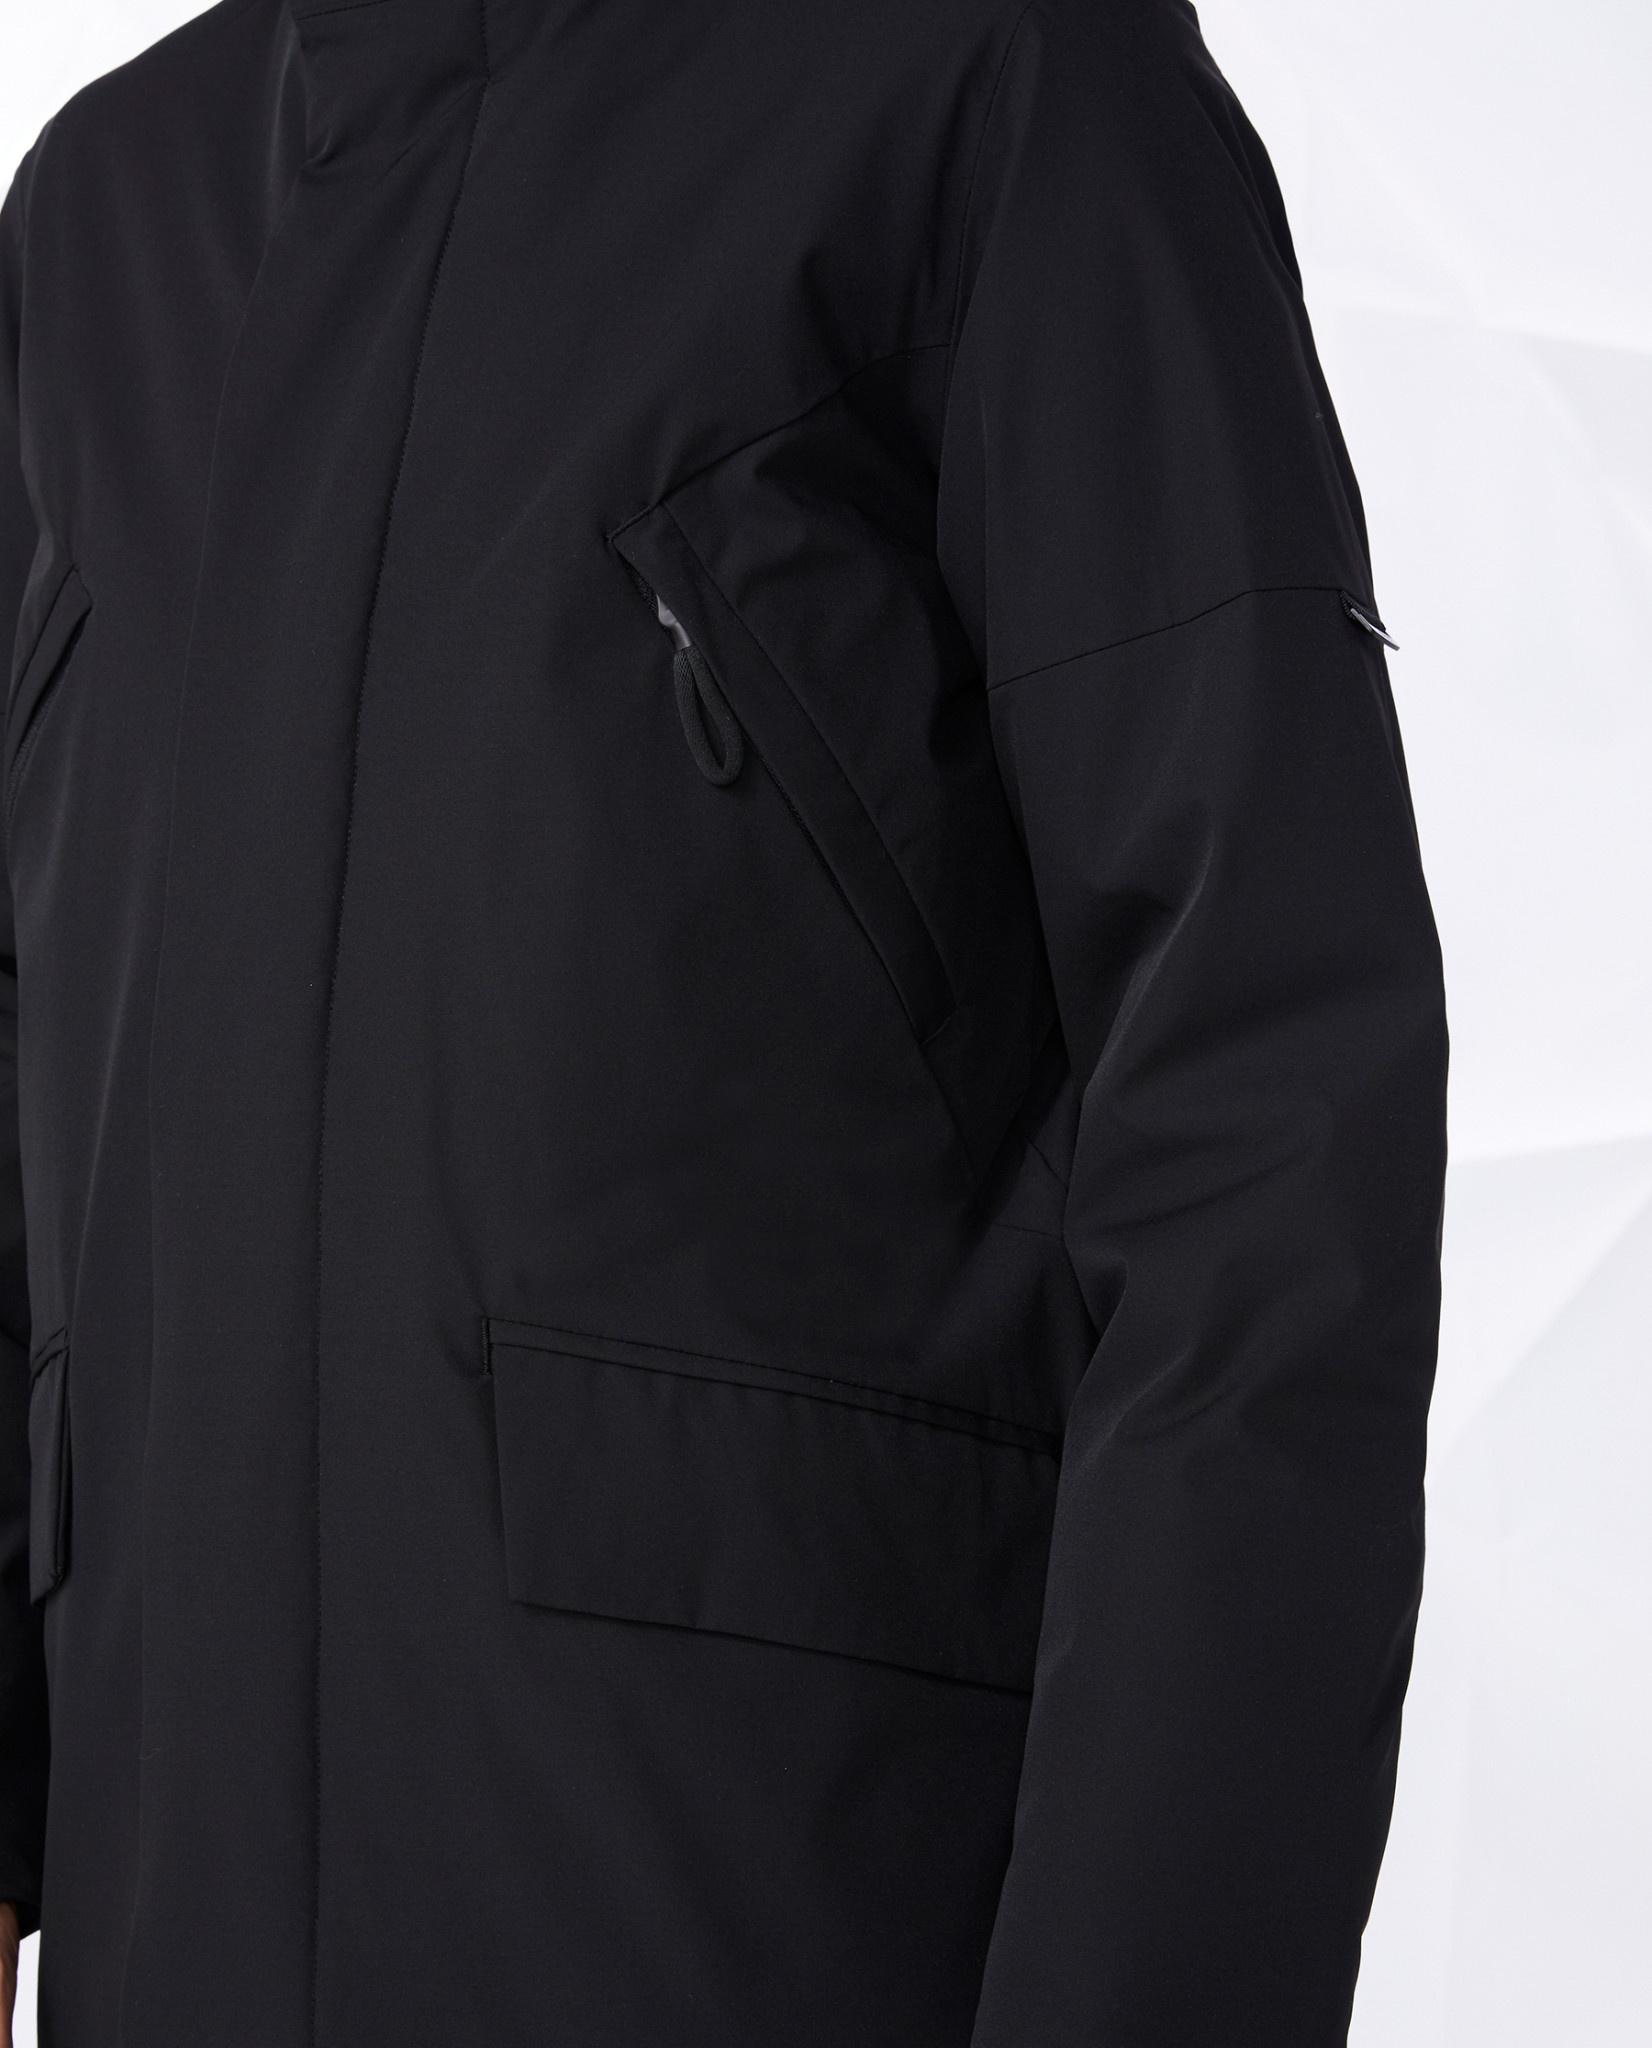 Elvine Elvine Zane Jacket Black